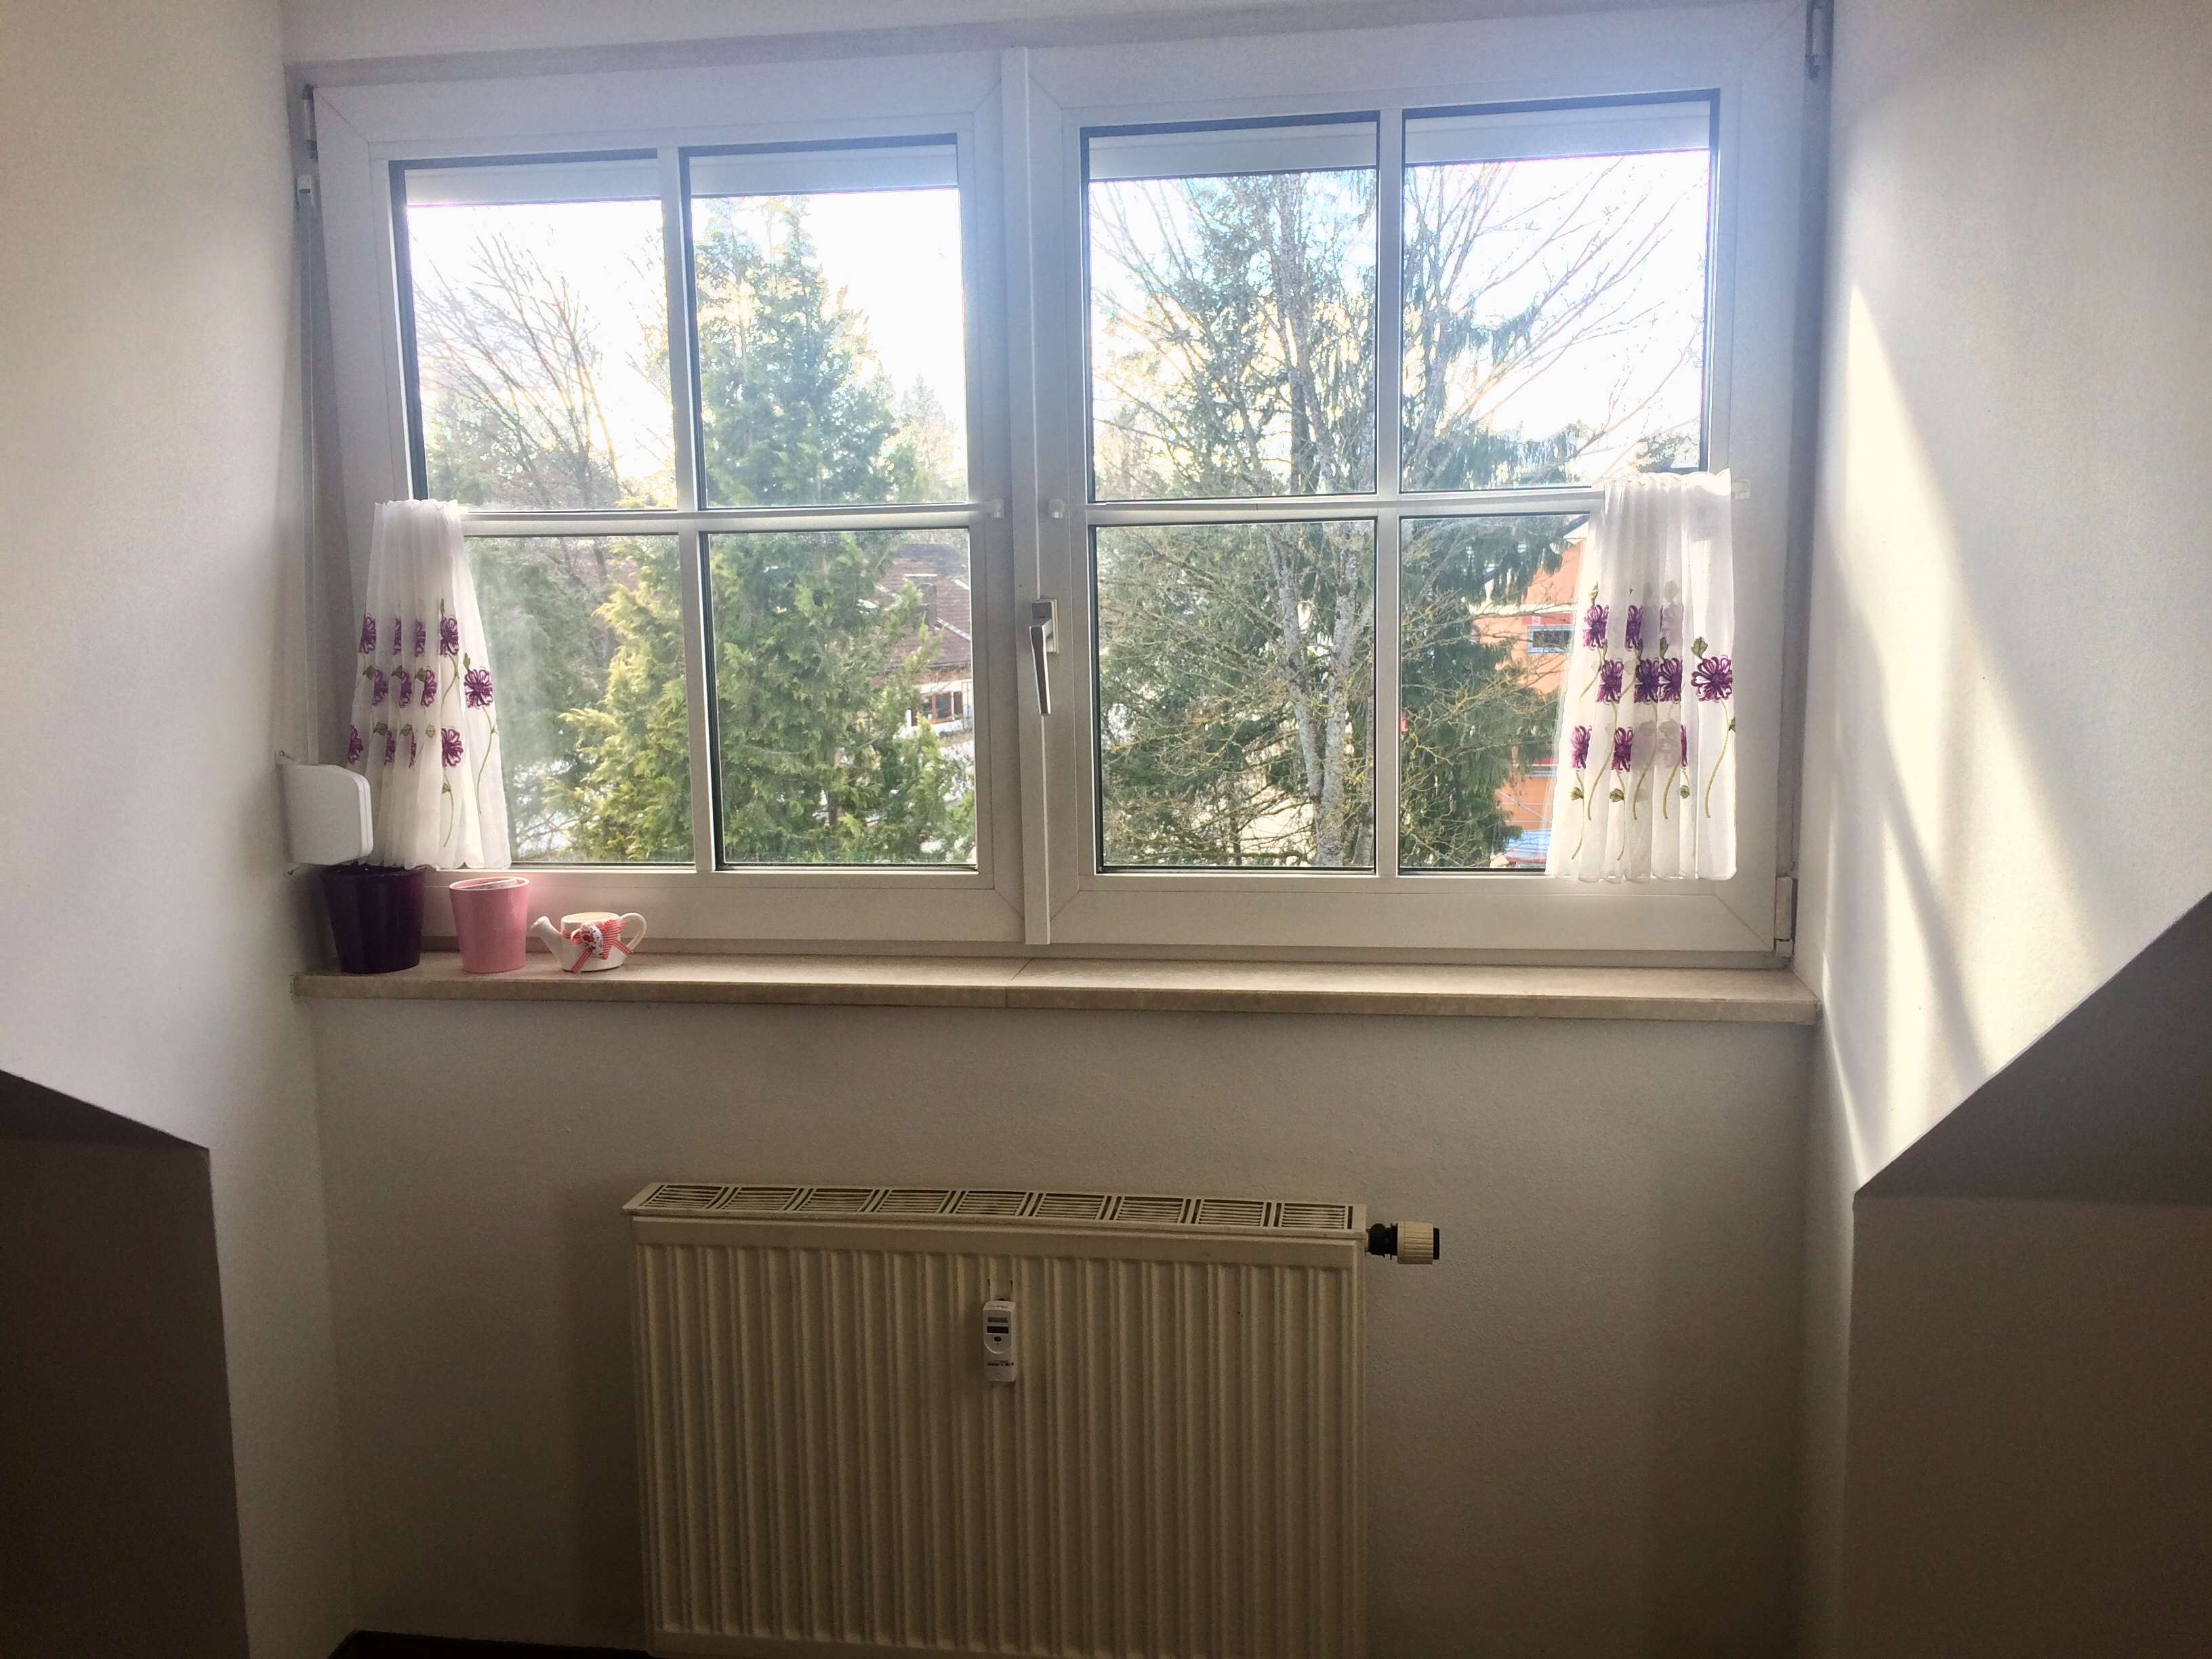 Helle, freundliche 2-Zimmer-Dachgeschoss-Wohnung in Neukeferloh in Grasbrunn